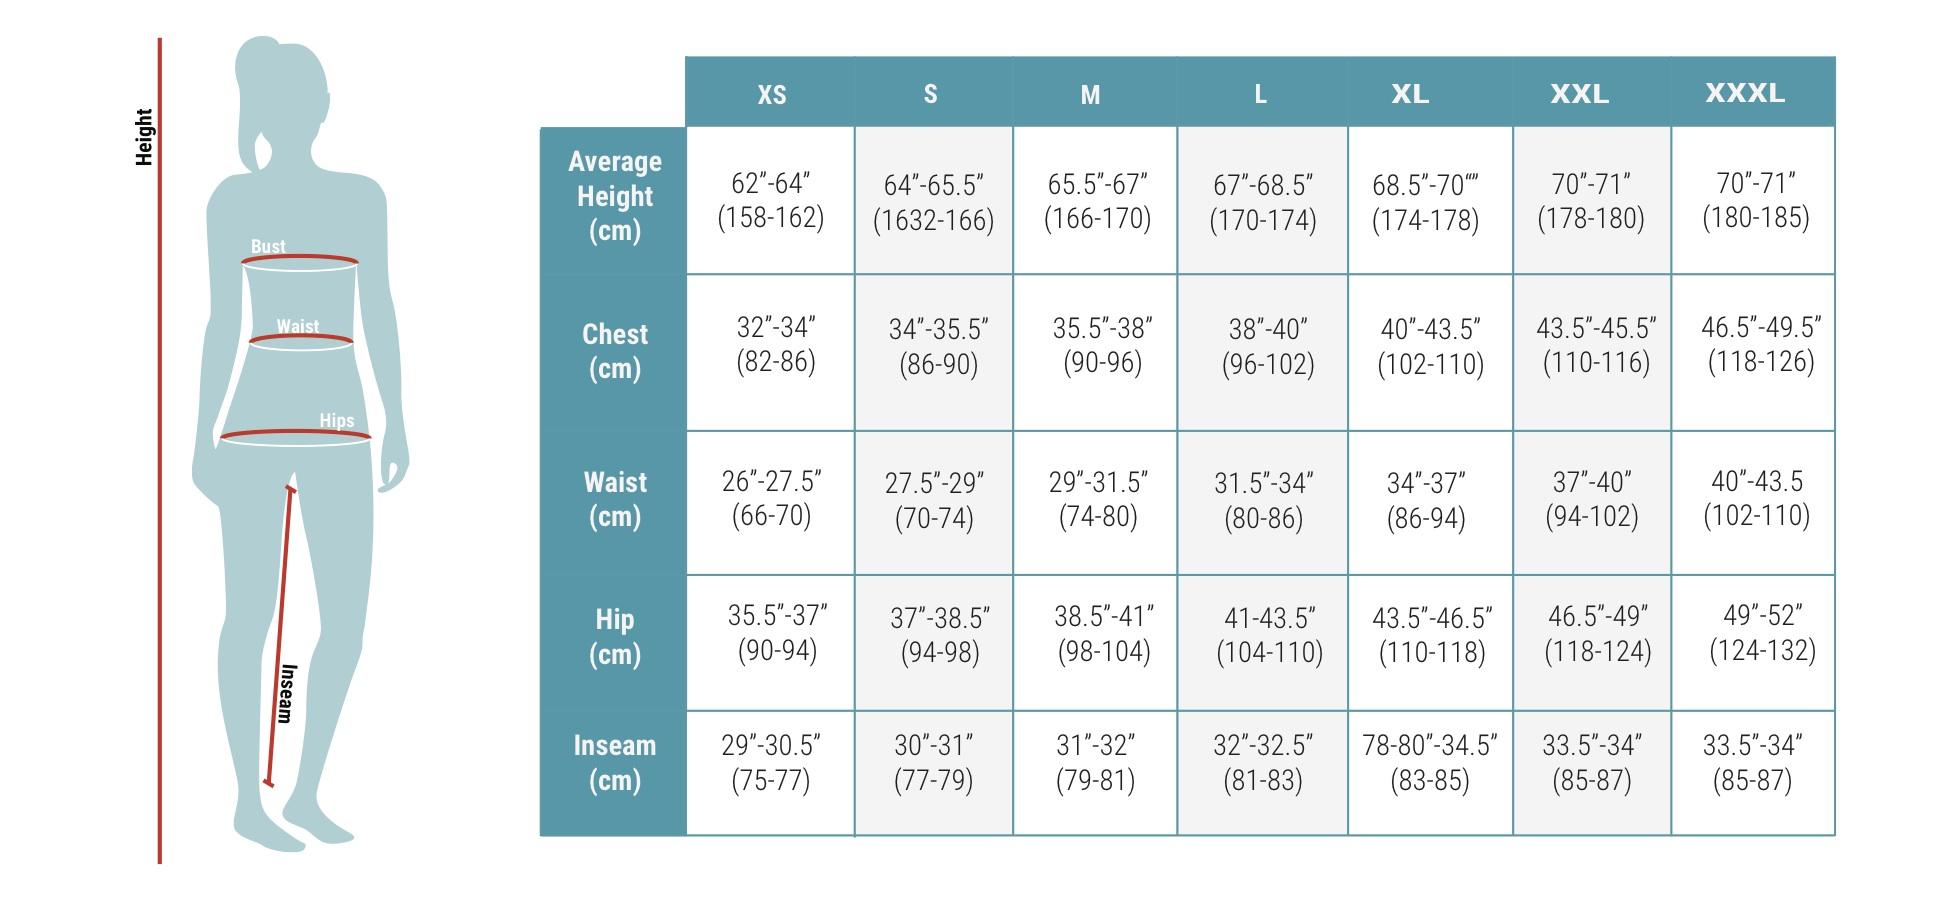 wcs-hh-womens-sizing-chart.jpg